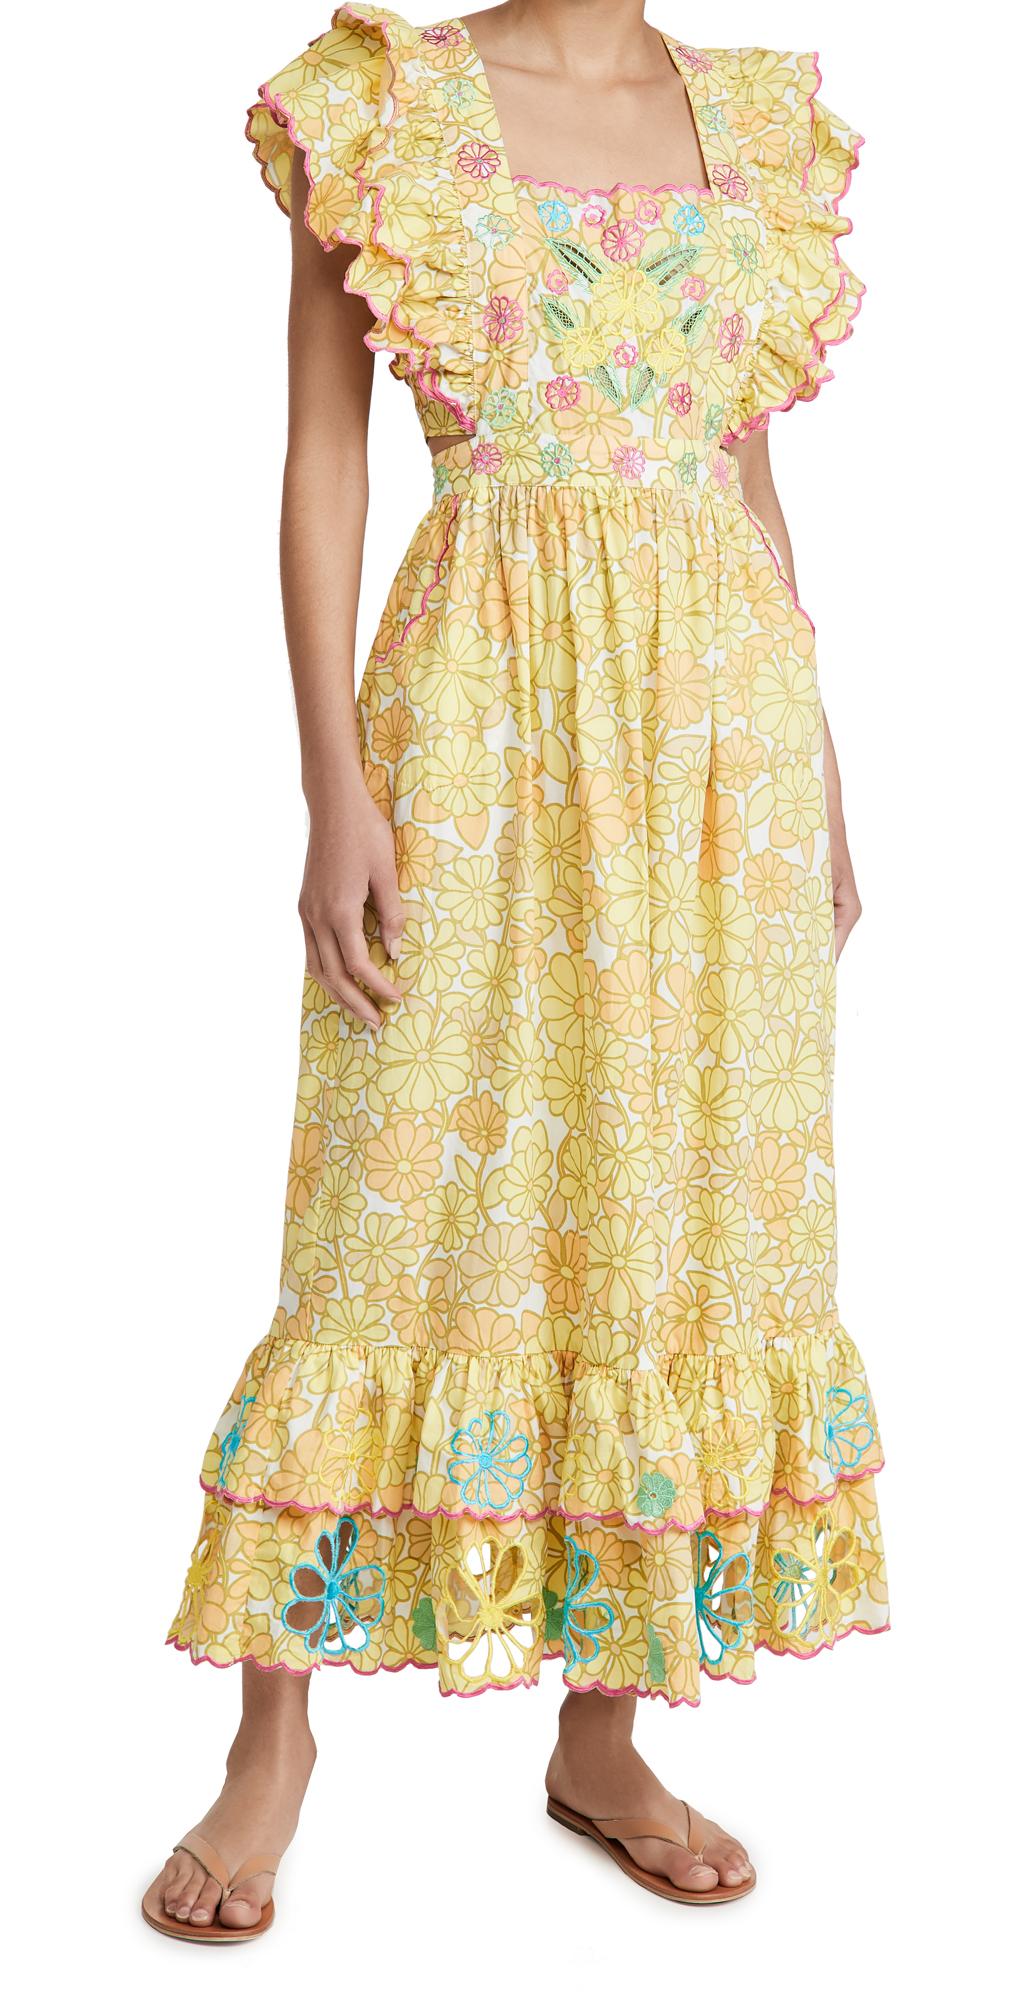 Madreselva Dress